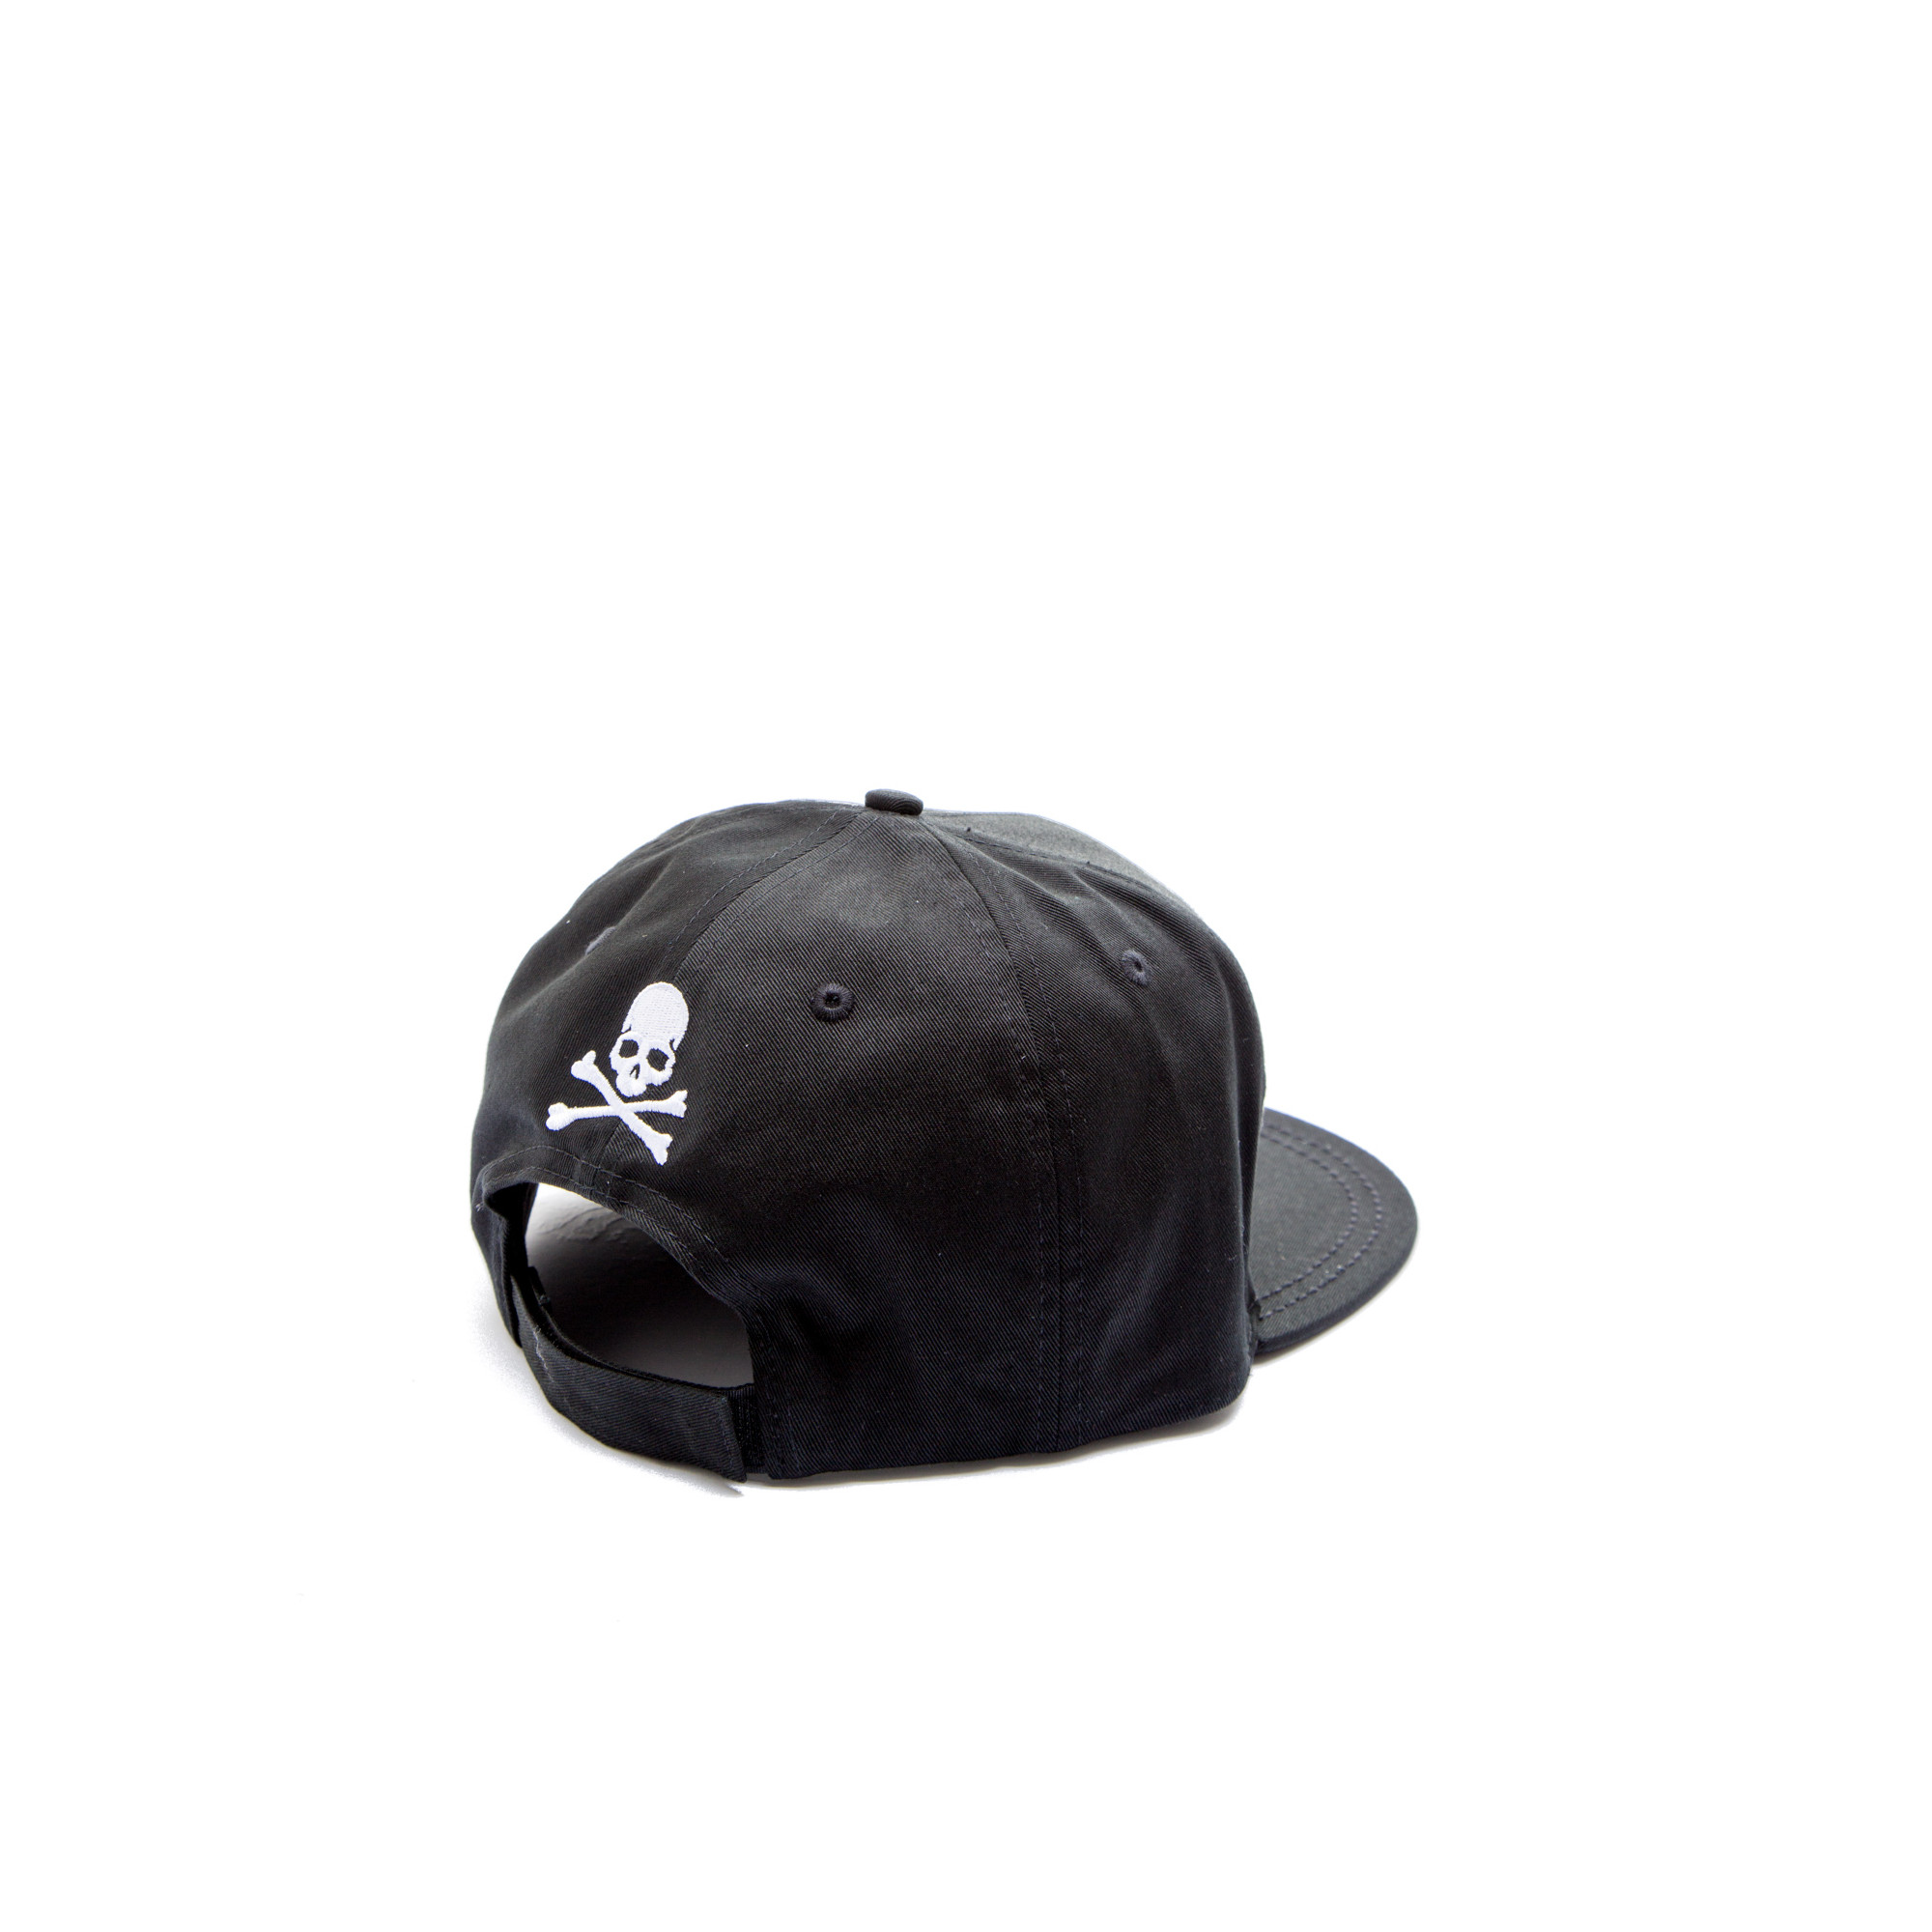 philipp plein baseball cap deland black. Black Bedroom Furniture Sets. Home Design Ideas